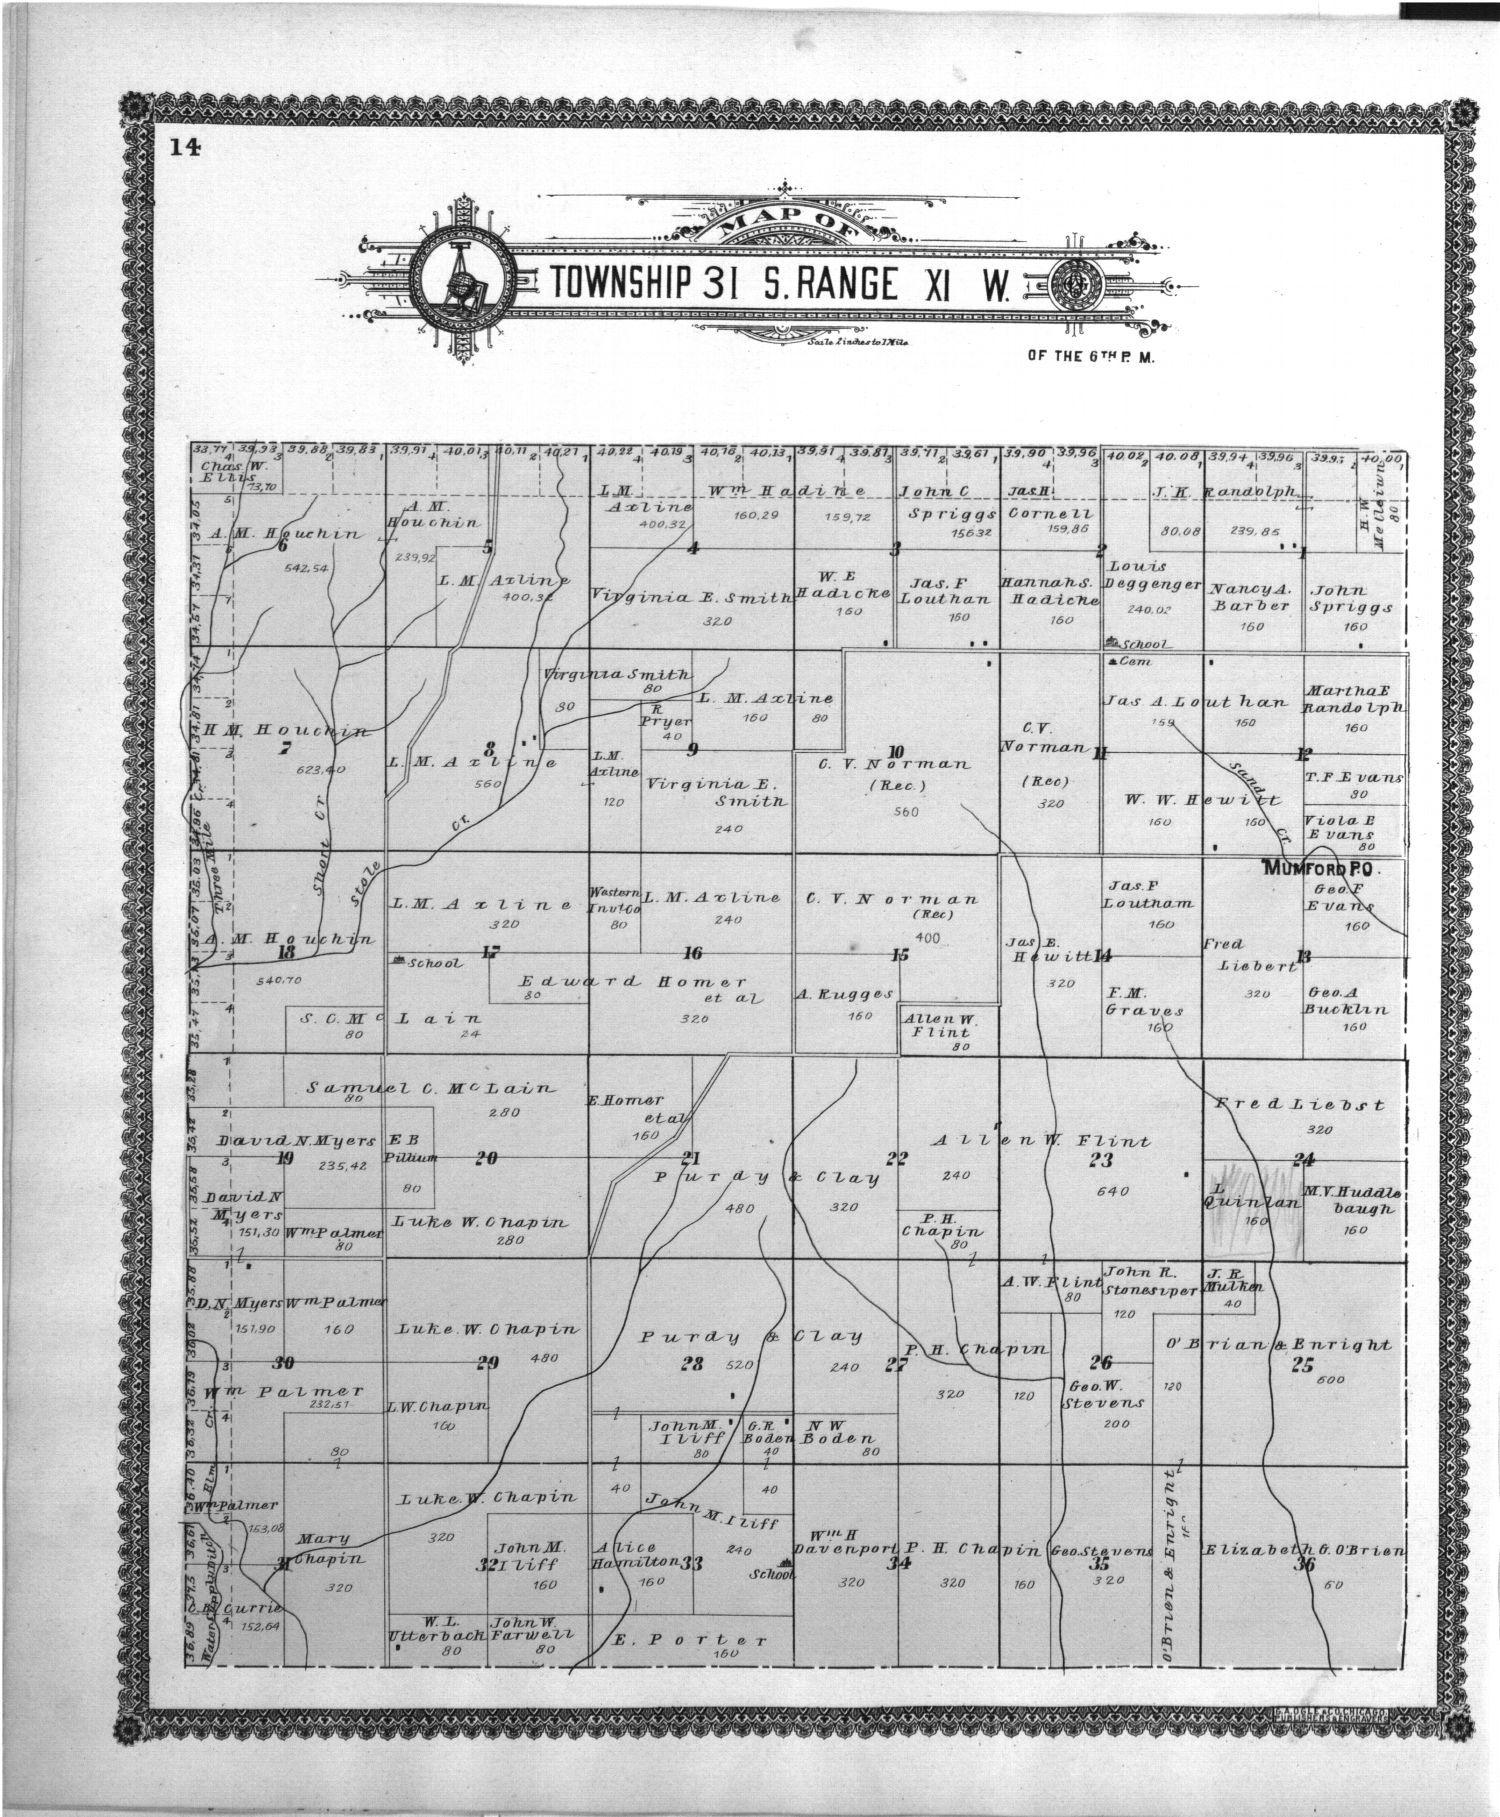 Standard atlas of Barber County, Kansas - 14